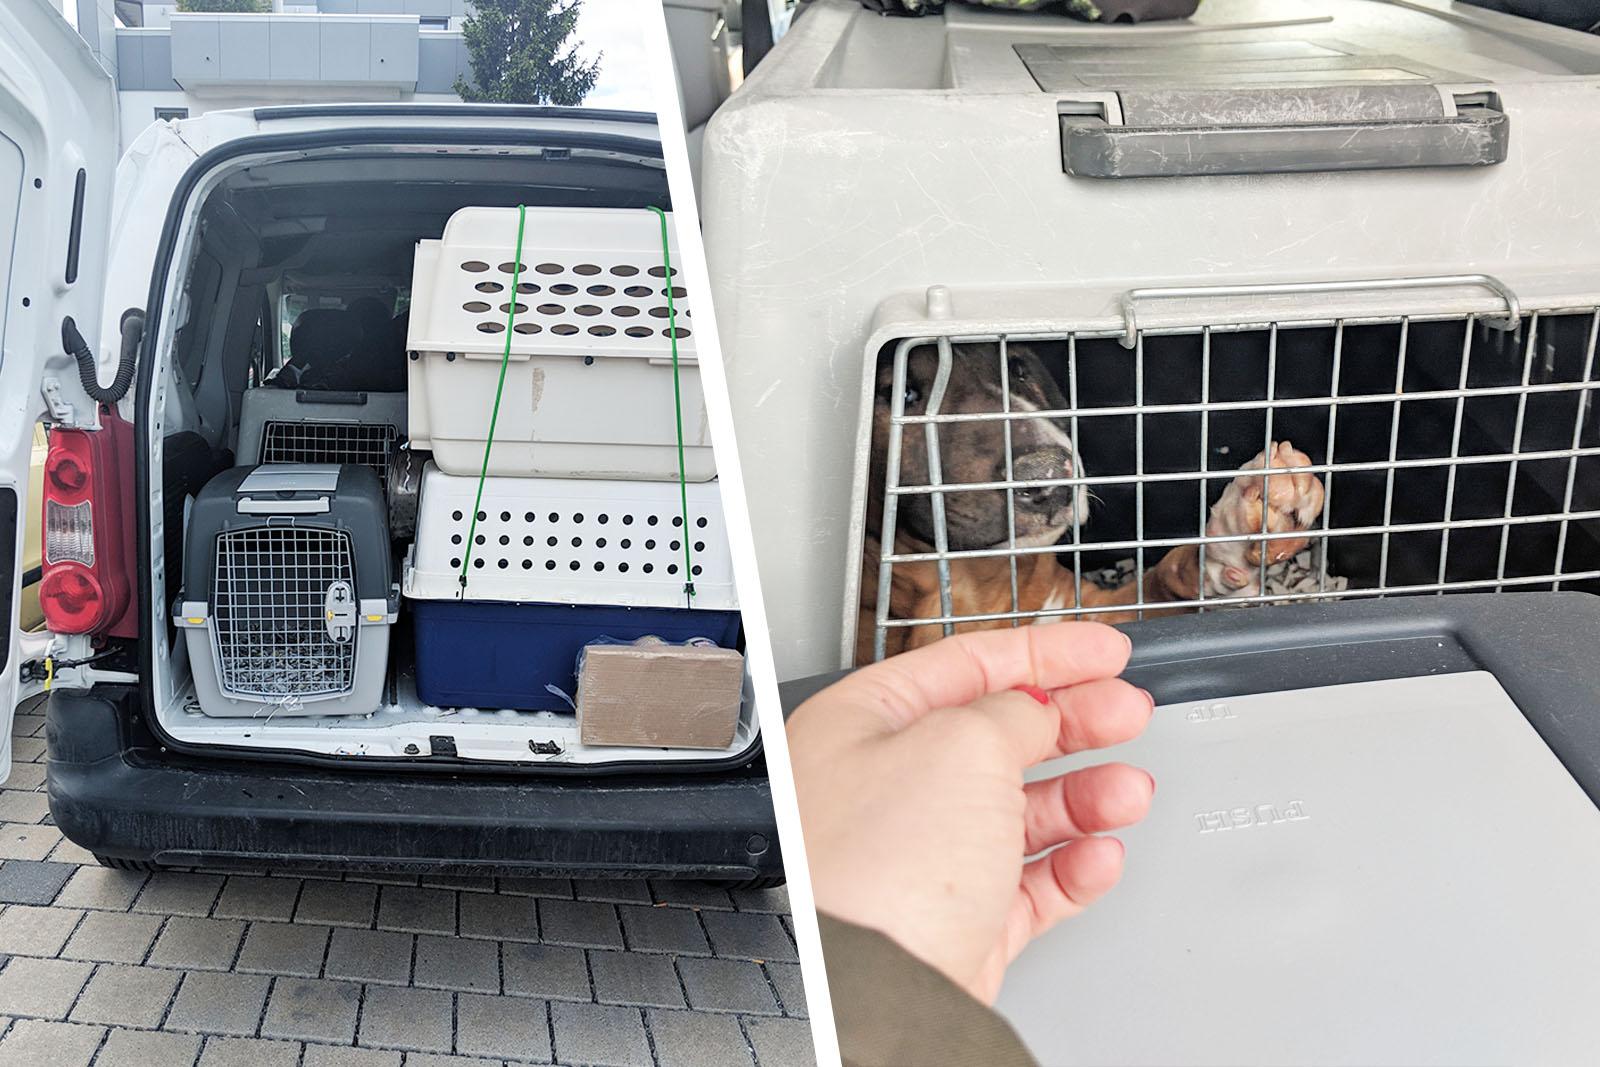 Hundebaby gerettet! Erneuter Schlag gegen Welpenmafia!